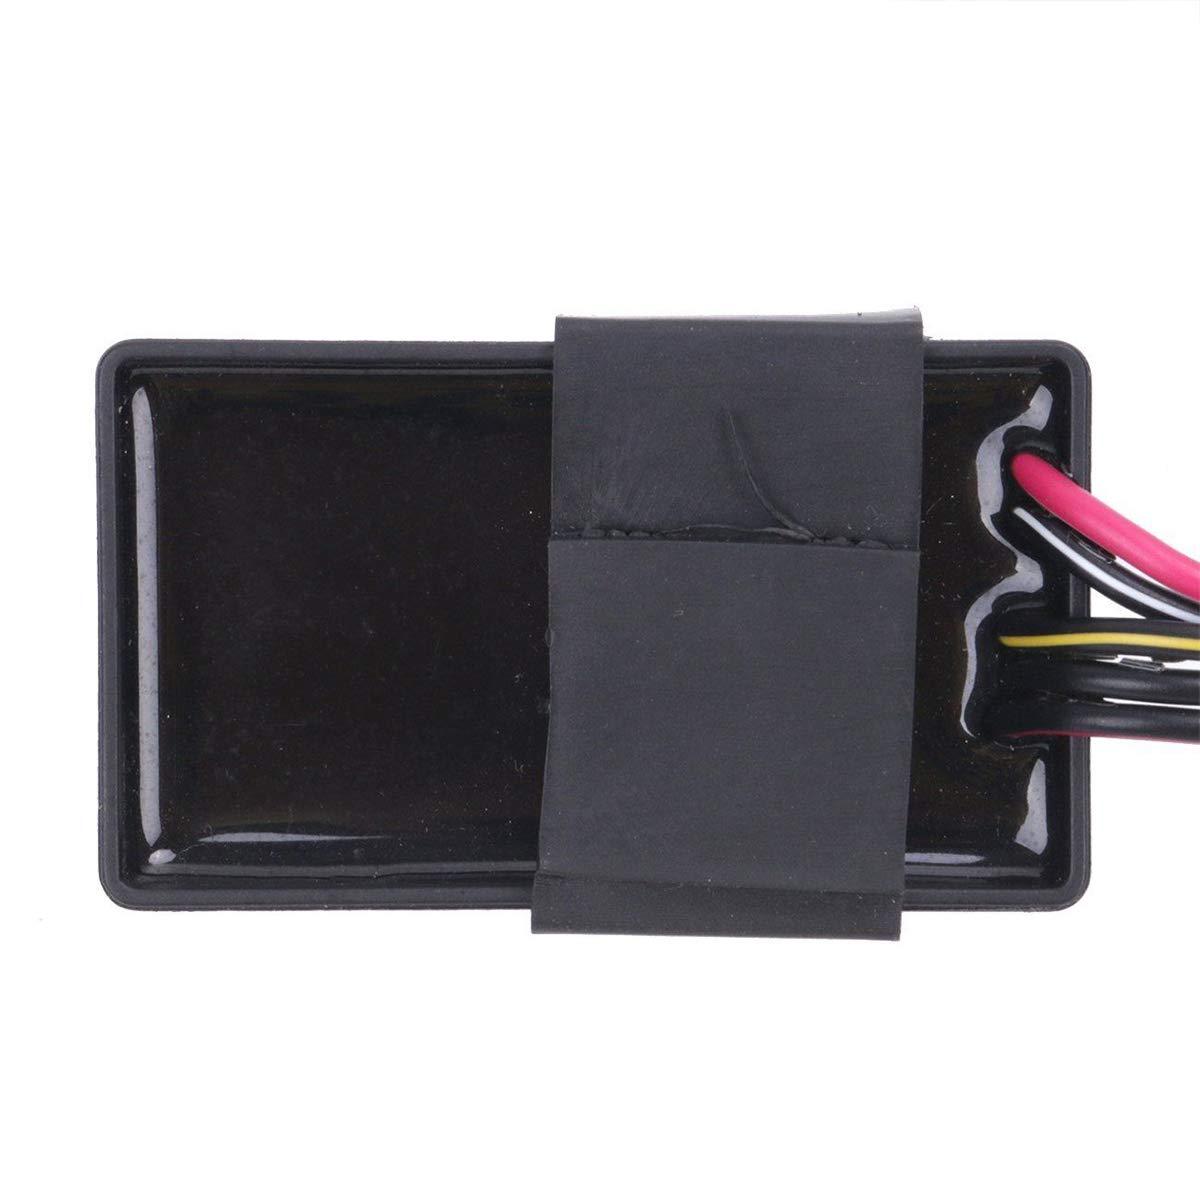 AUTVAN CDI Box Module For Yamaha Peewee PY50 PW50 CDI Ignition COIL Control Box Unit Module YP524